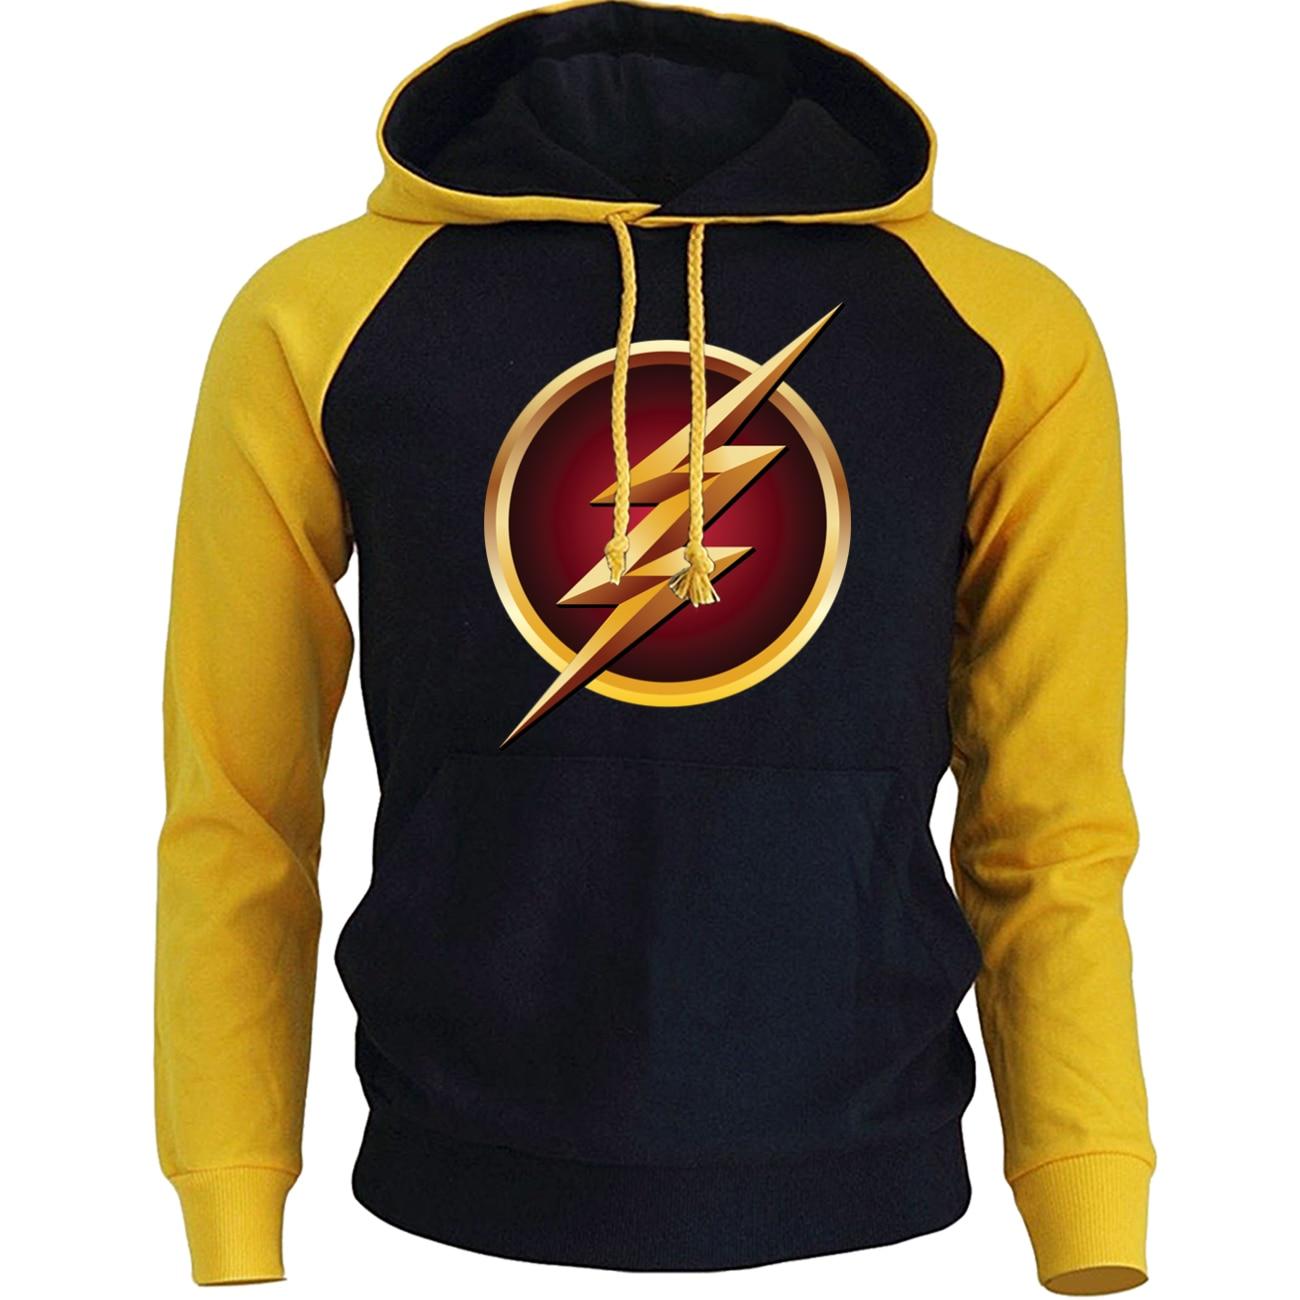 The Flash Man Hoodies Raglan Men Streetwear Hip Hop Casual Hooded Spring Winter Male Fleece Pullover Funny Print Sweatshirts